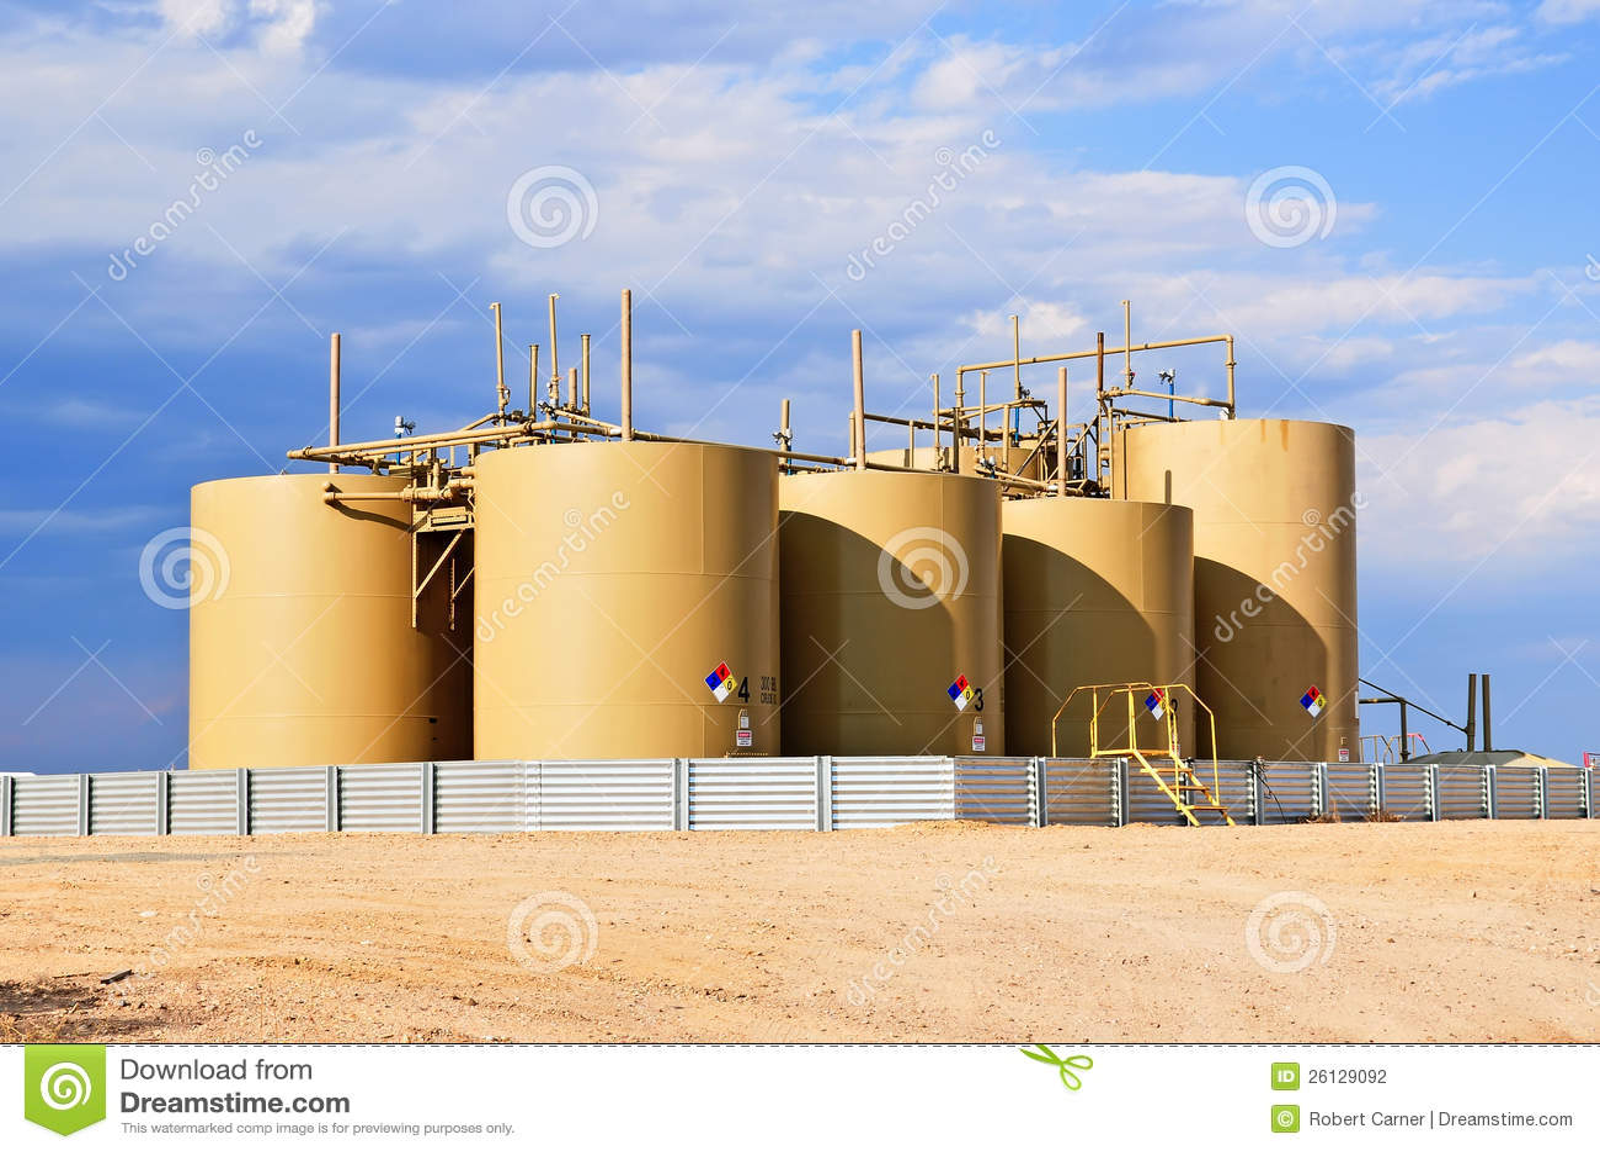 Crude Oil Storage Tanks in Central Colorado, USA